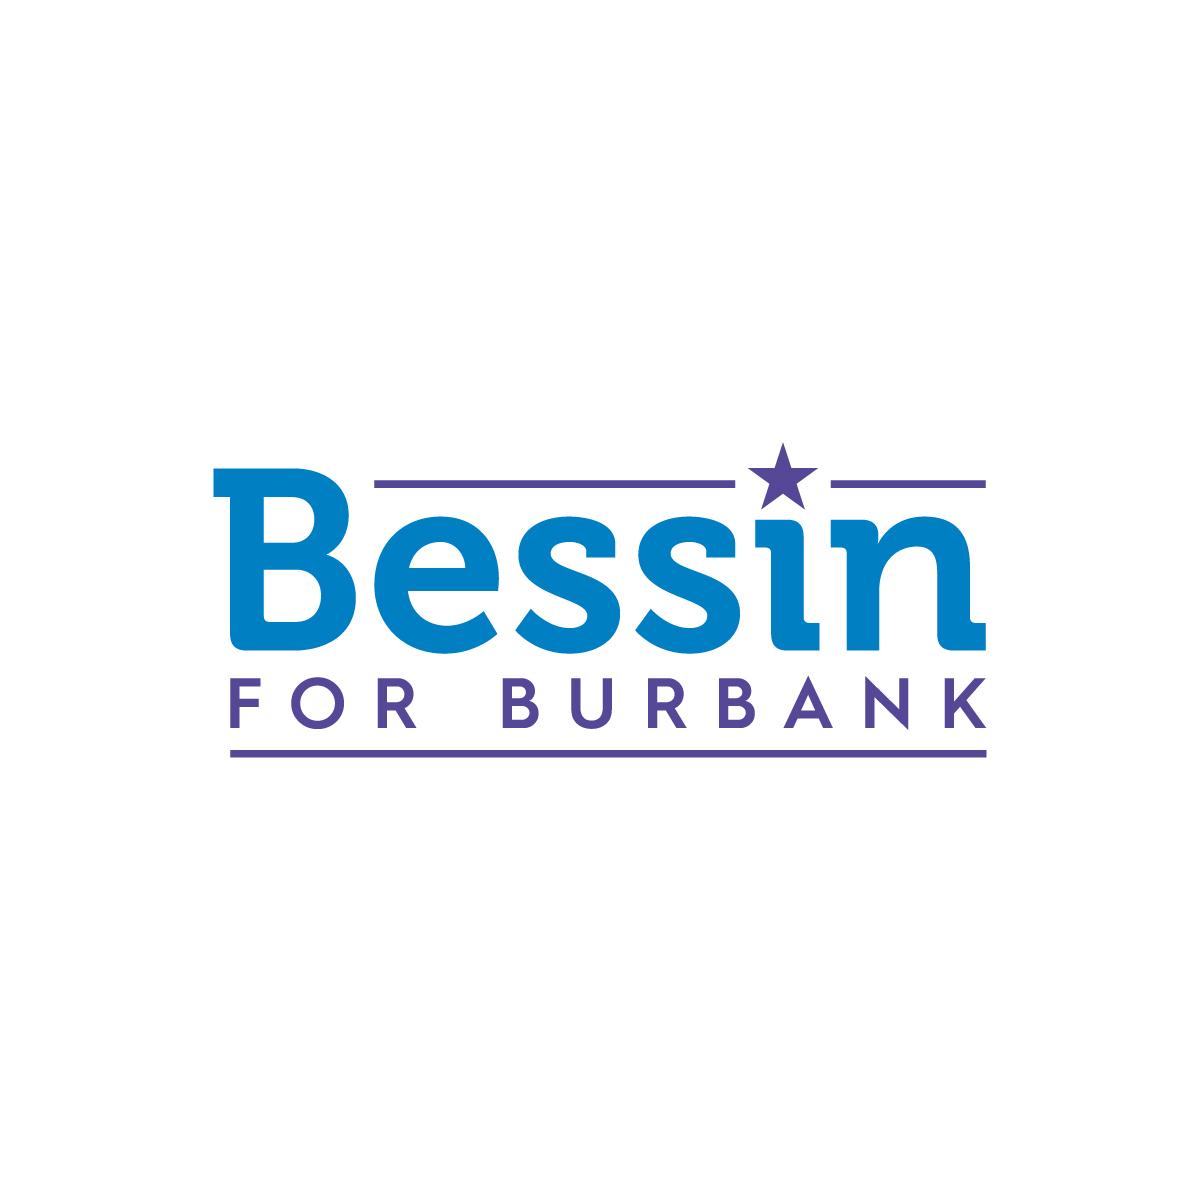 Return to Bessin 4 Burbank